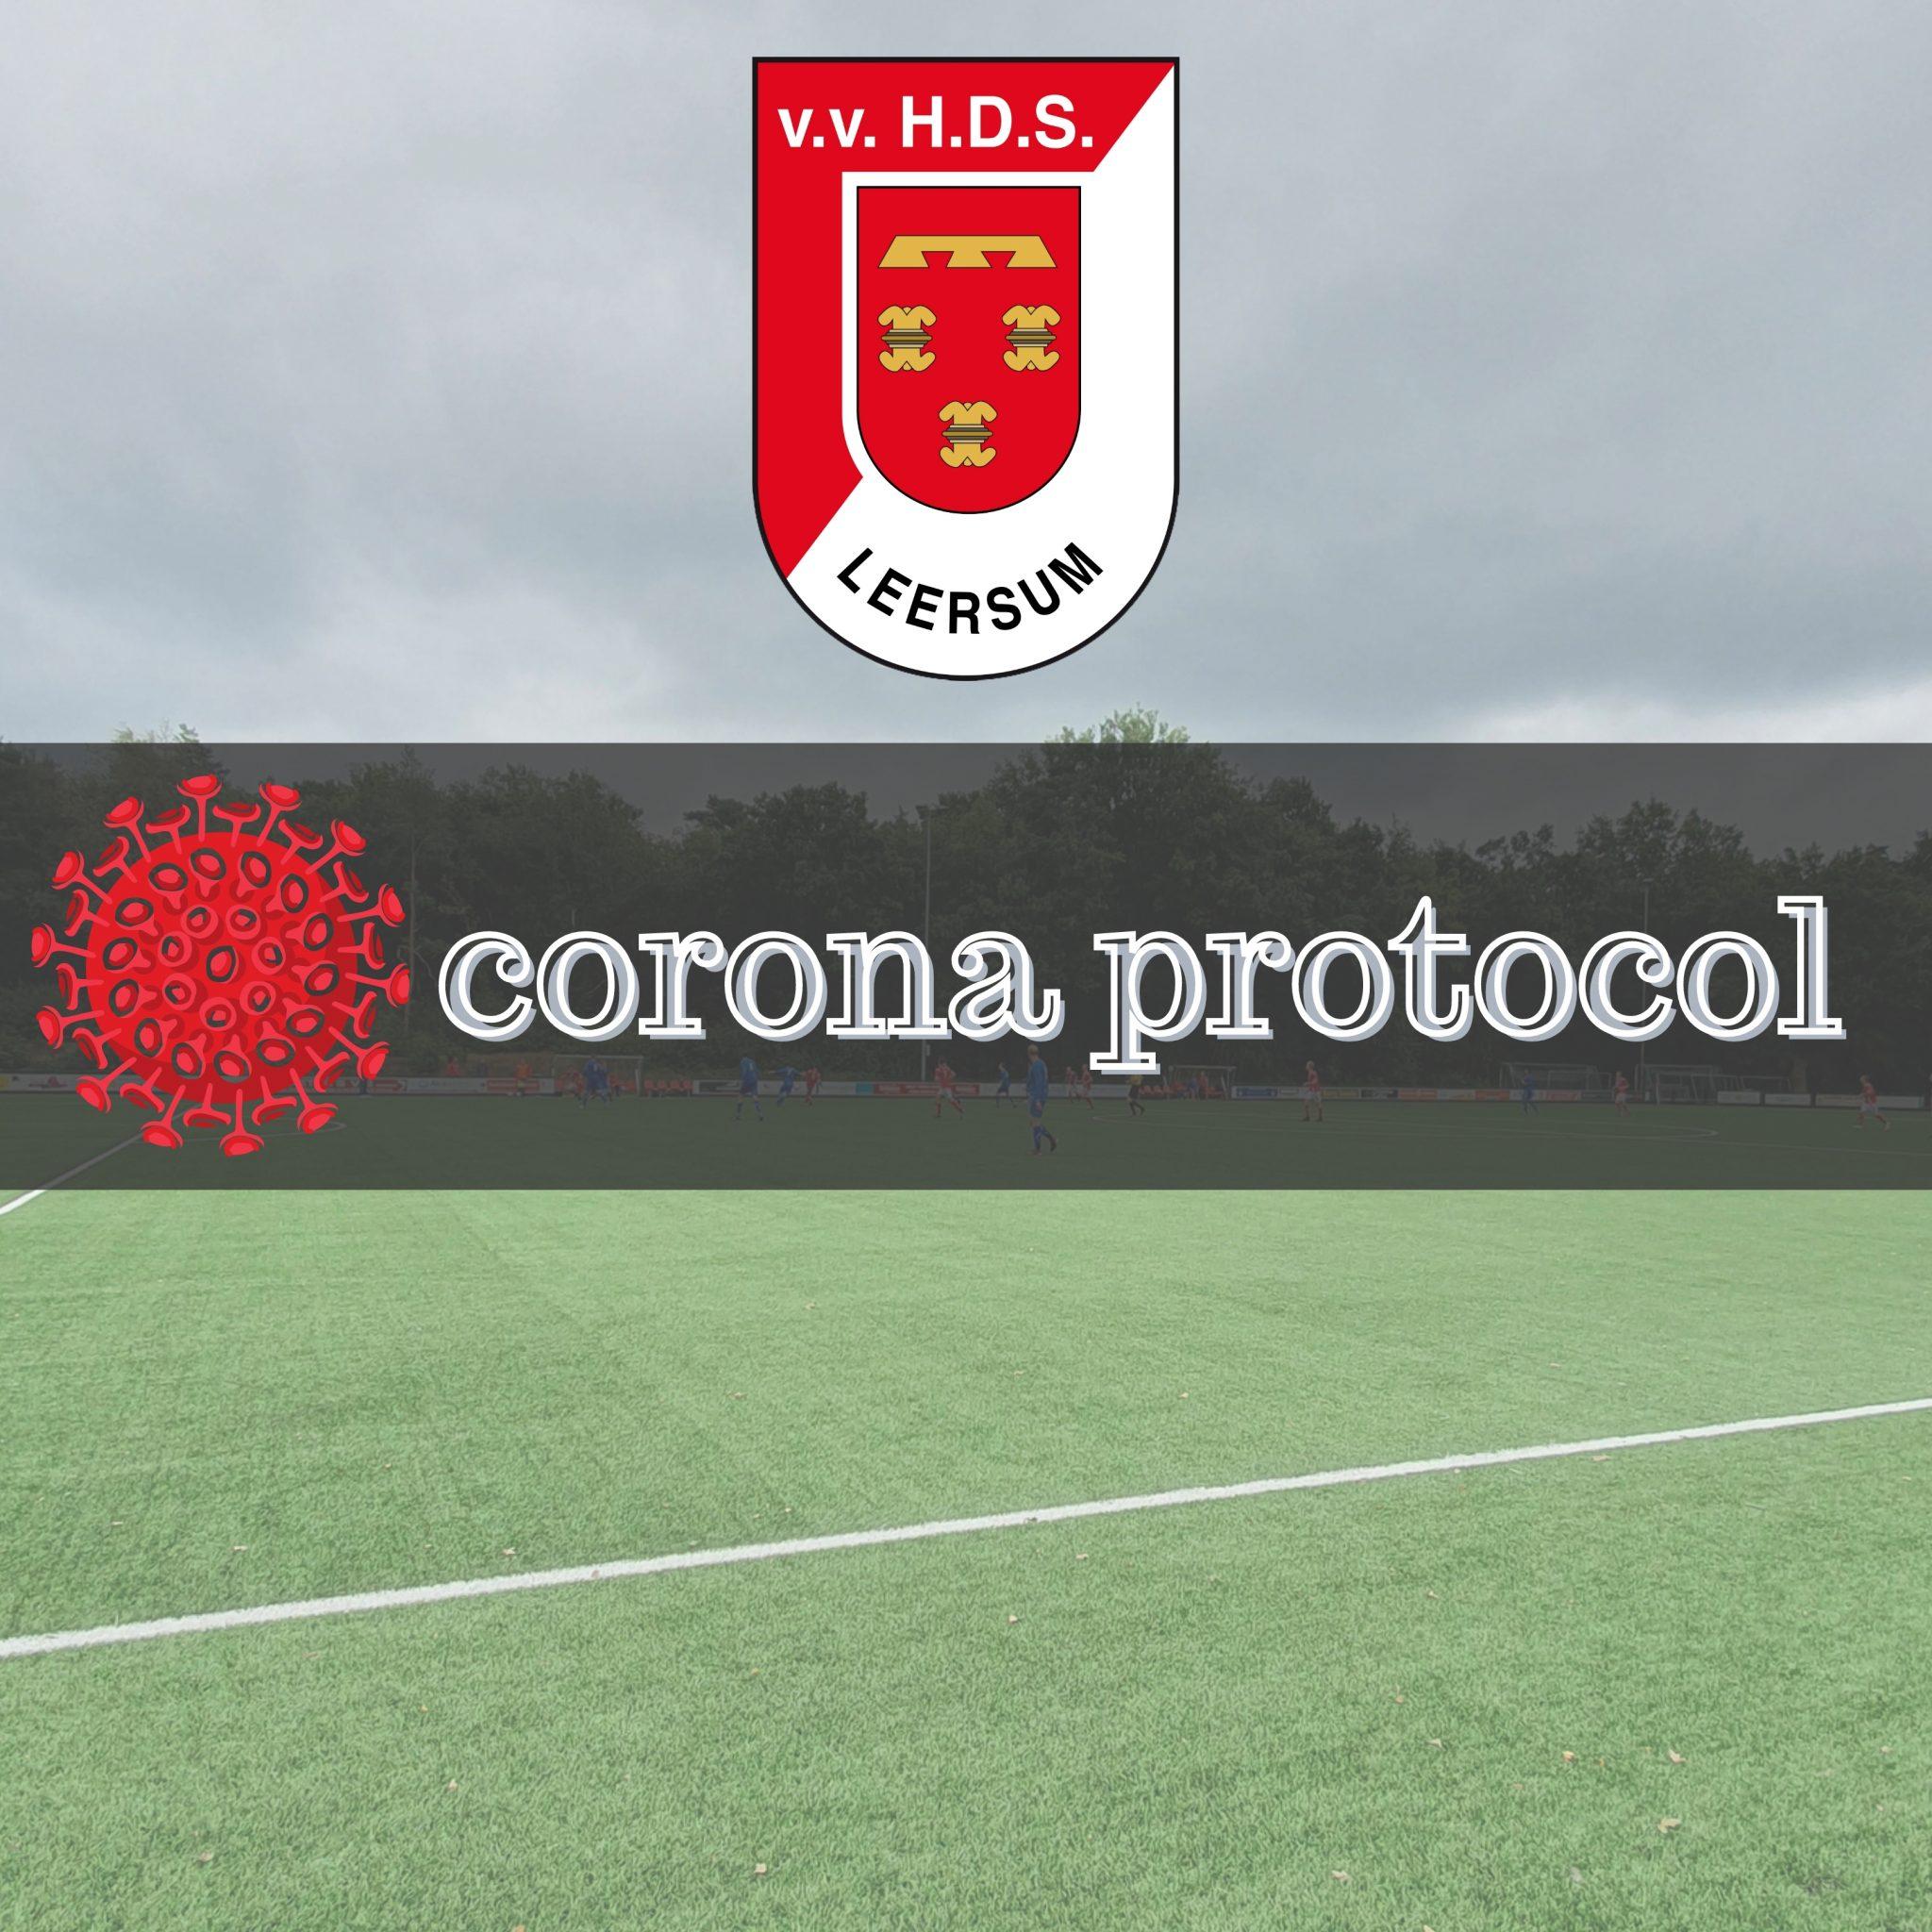 Corona protocol HDS (update 22-06-2020)